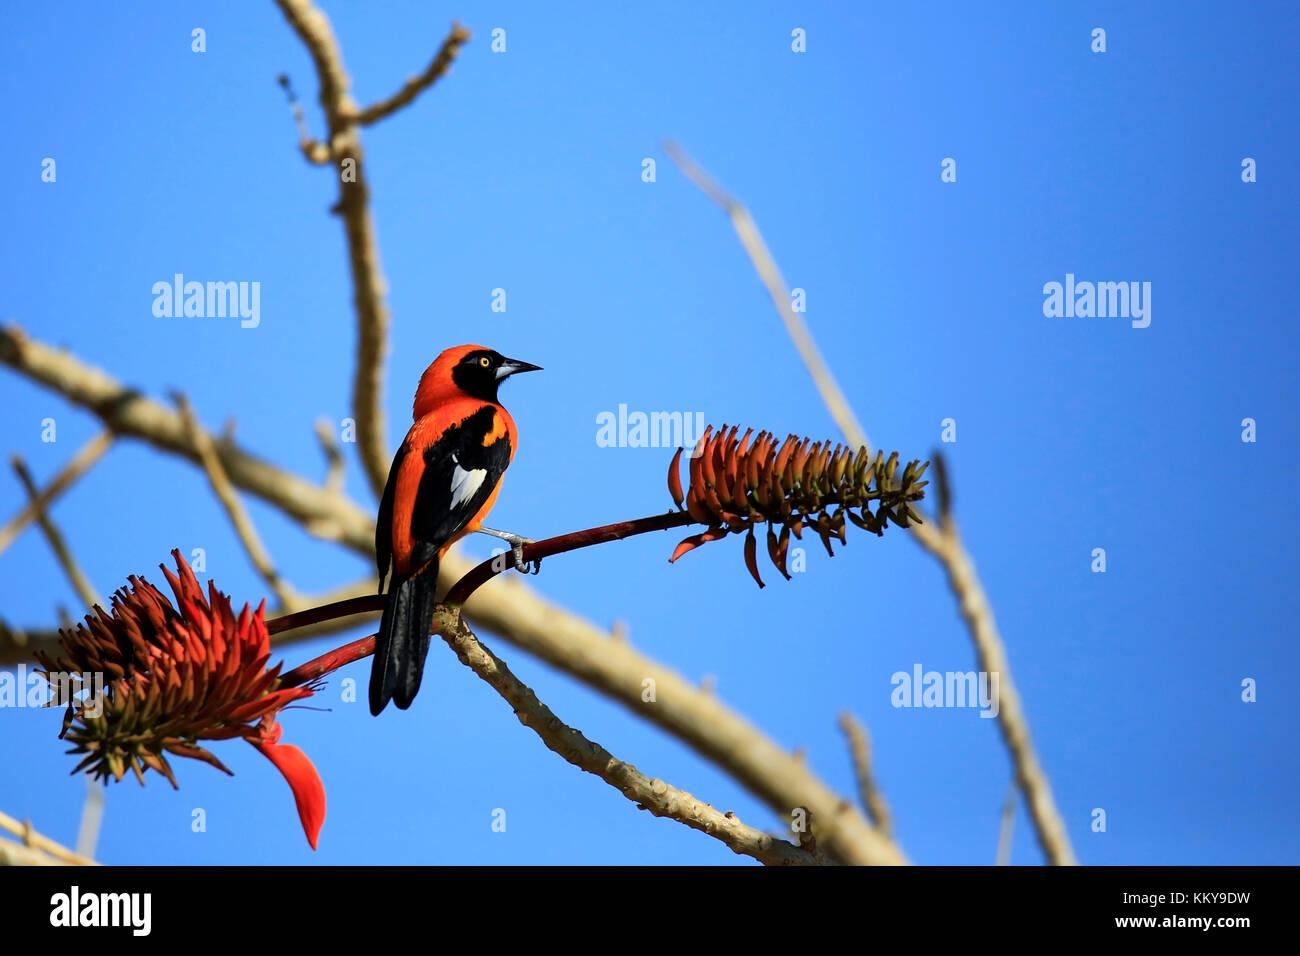 Orange-backed Troupial on a Branch. Pantanal, Brazil - Stock Image